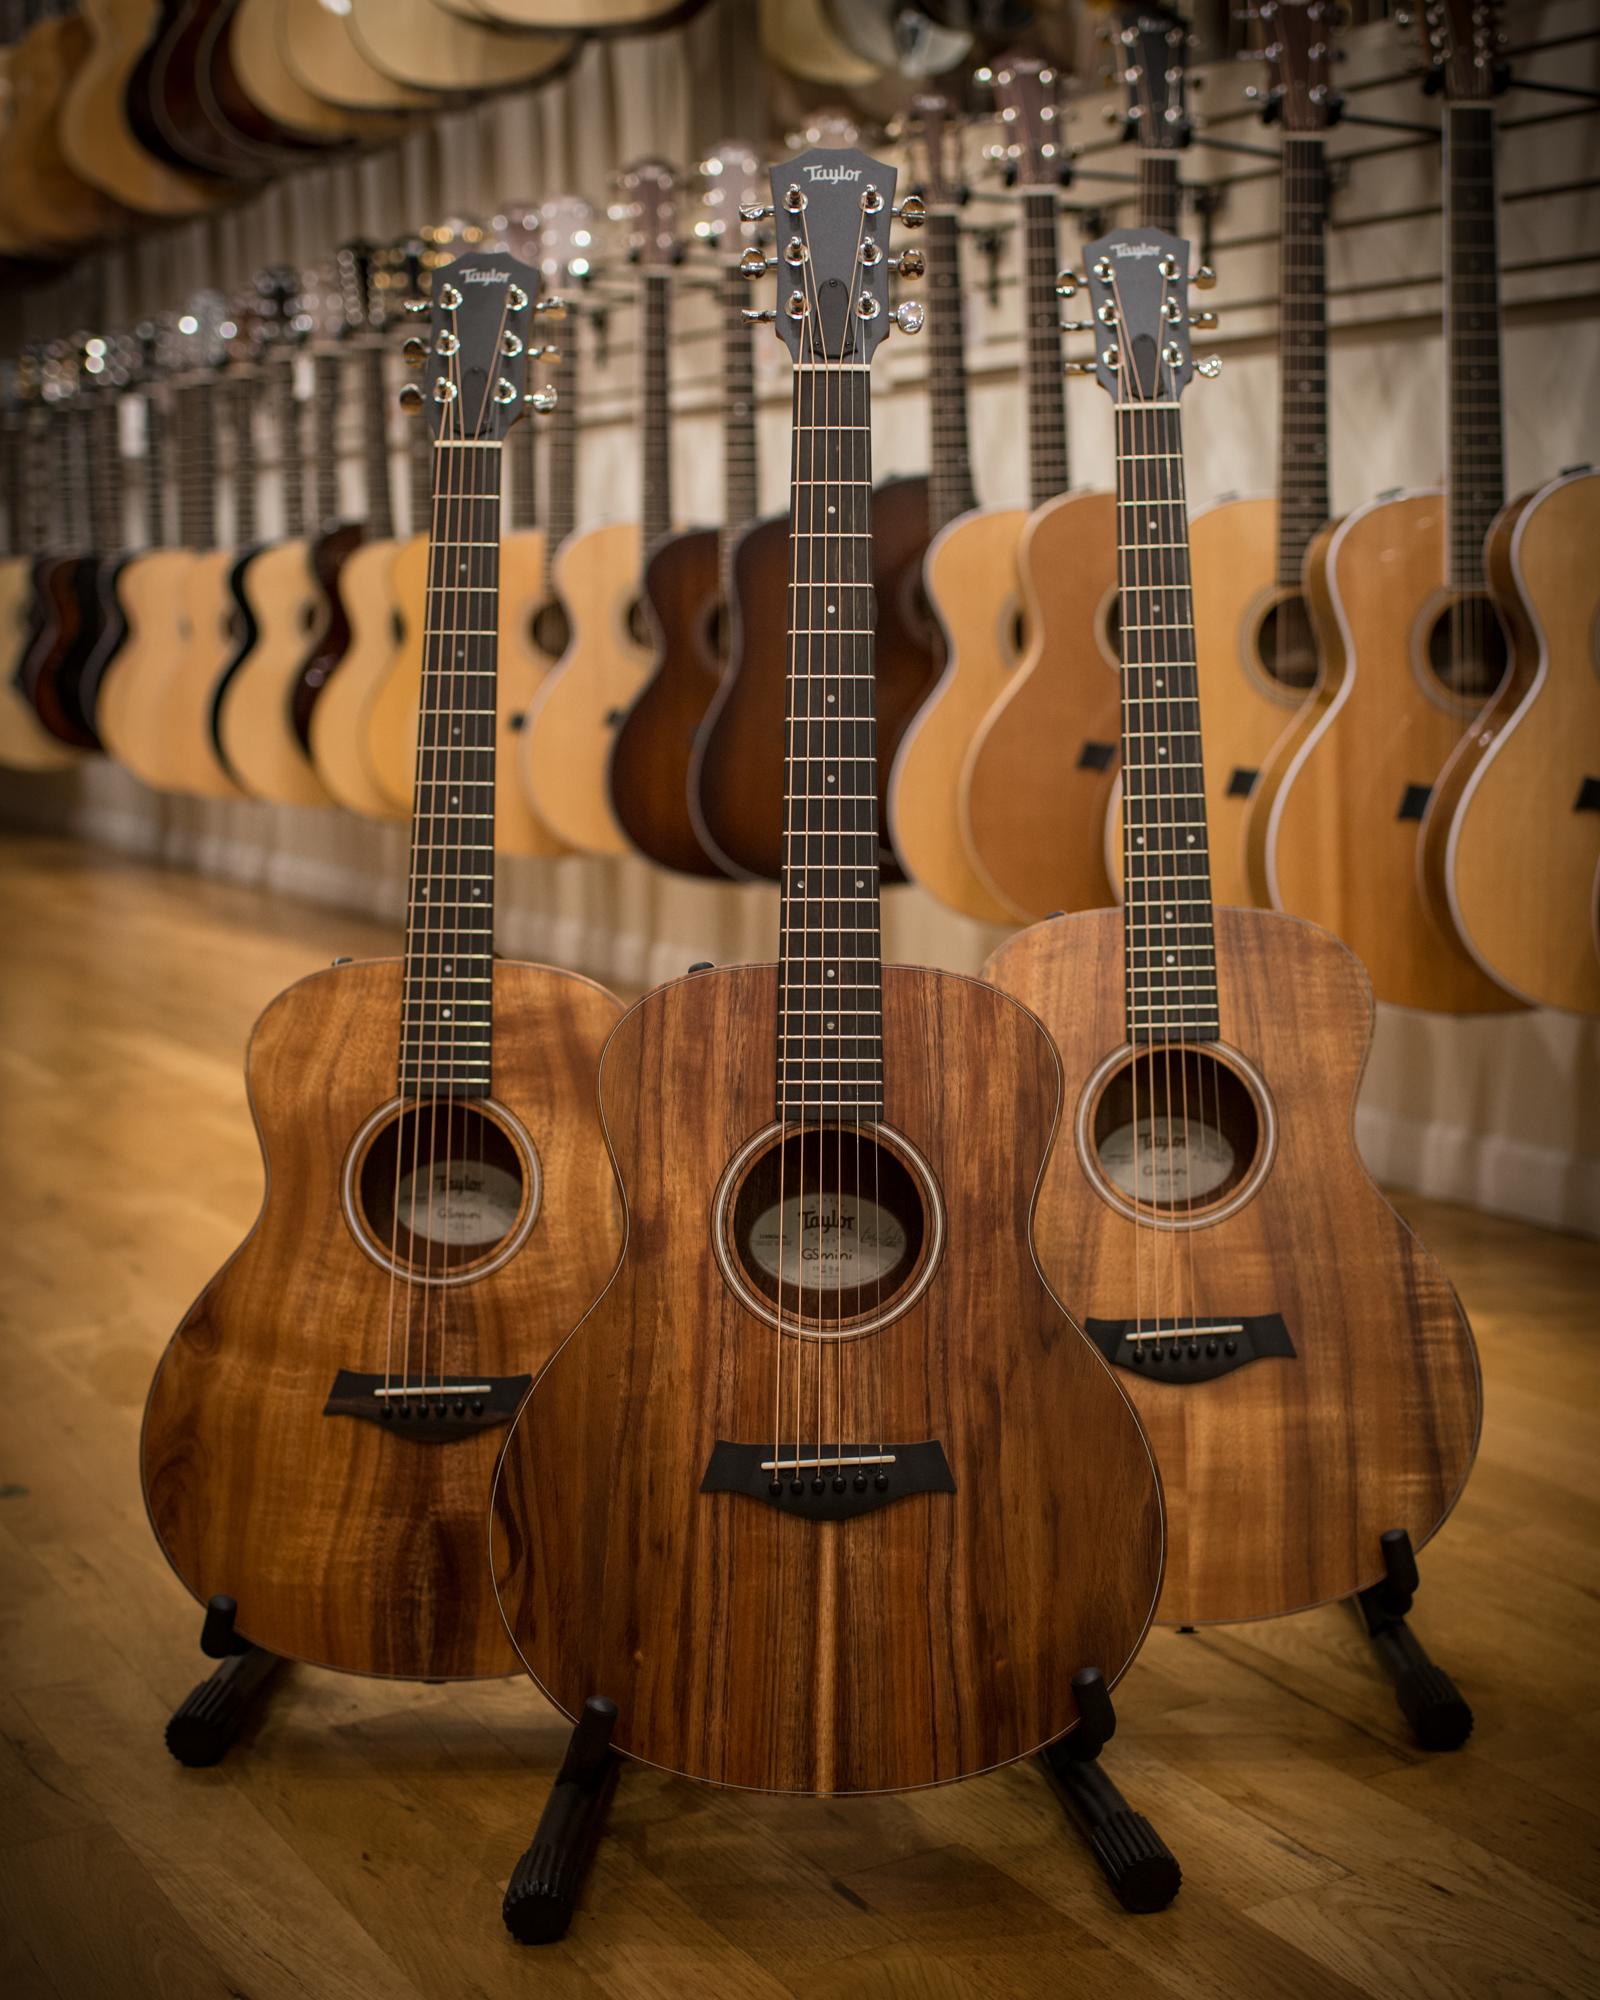 Taylor Guitars   Chicago Music Exchange